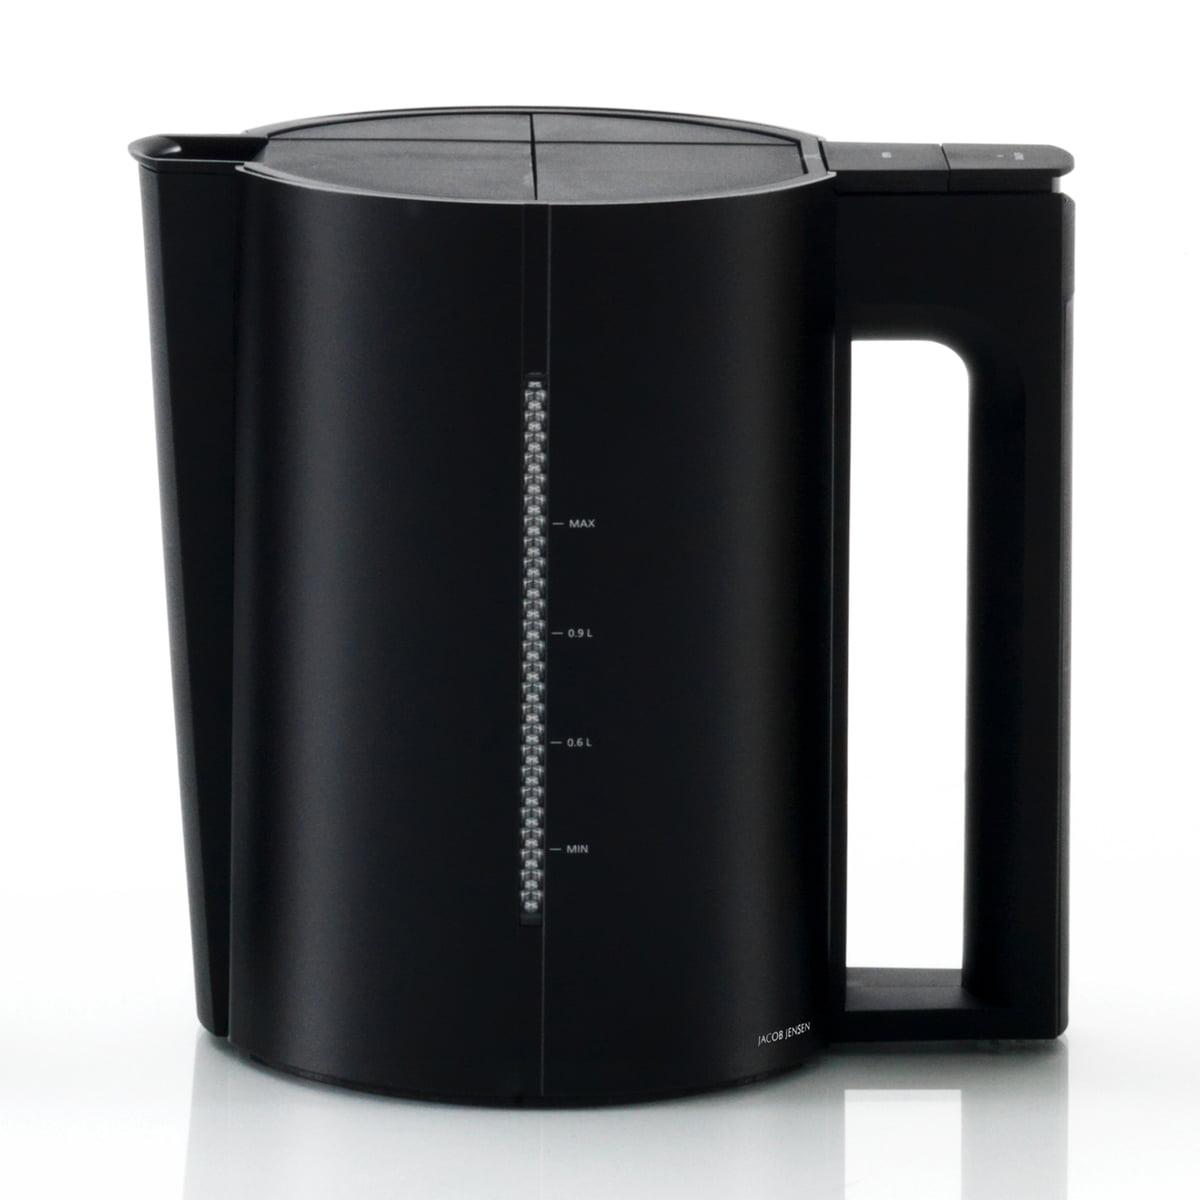 Jacob Jensen - Wasserkocher 1.2 Liter, mattschwarz